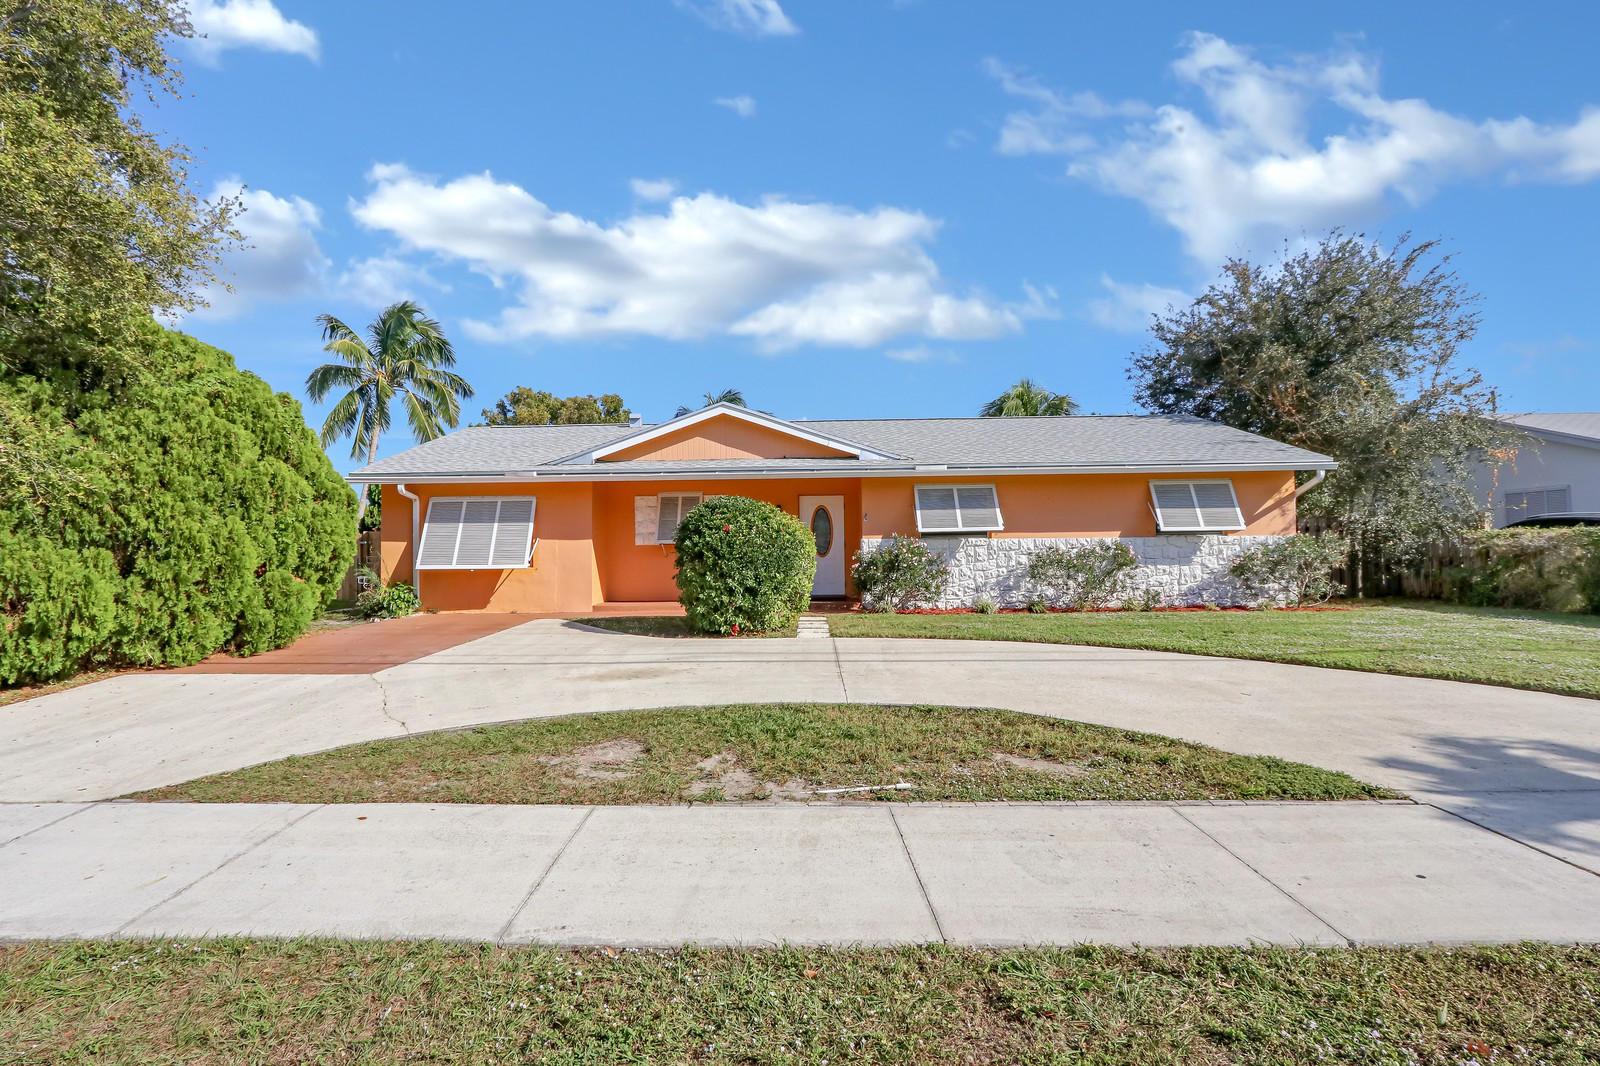 736 Prosperity Farms Road, North Palm Beach, Florida 33408, 3 Bedrooms Bedrooms, ,2 BathroomsBathrooms,A,Single family,Prosperity Farms,RX-10489697